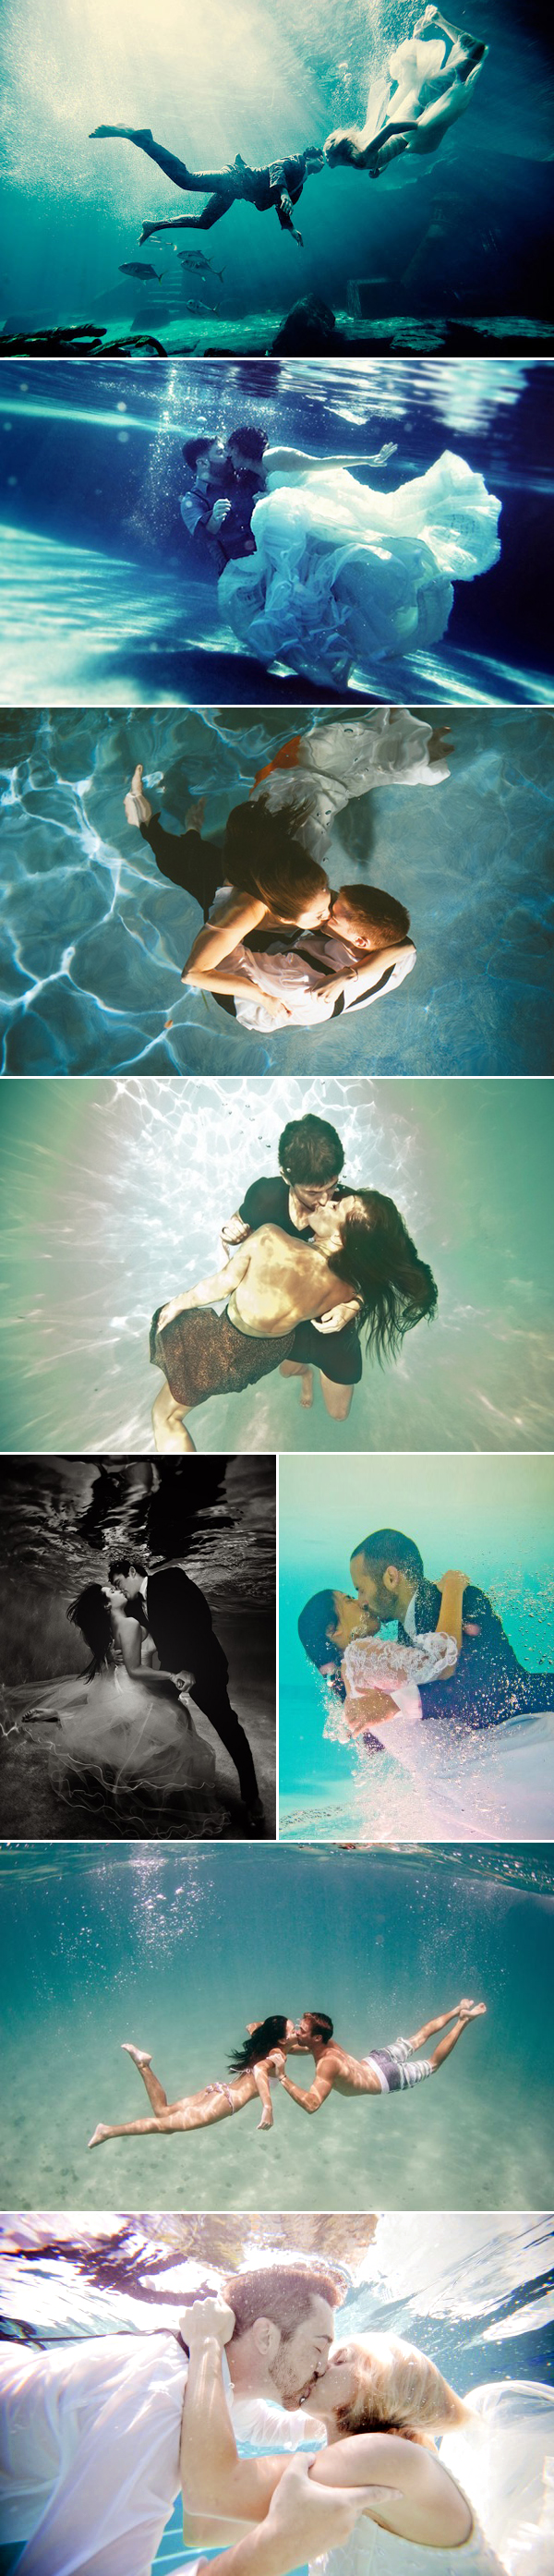 underwater01-romantic